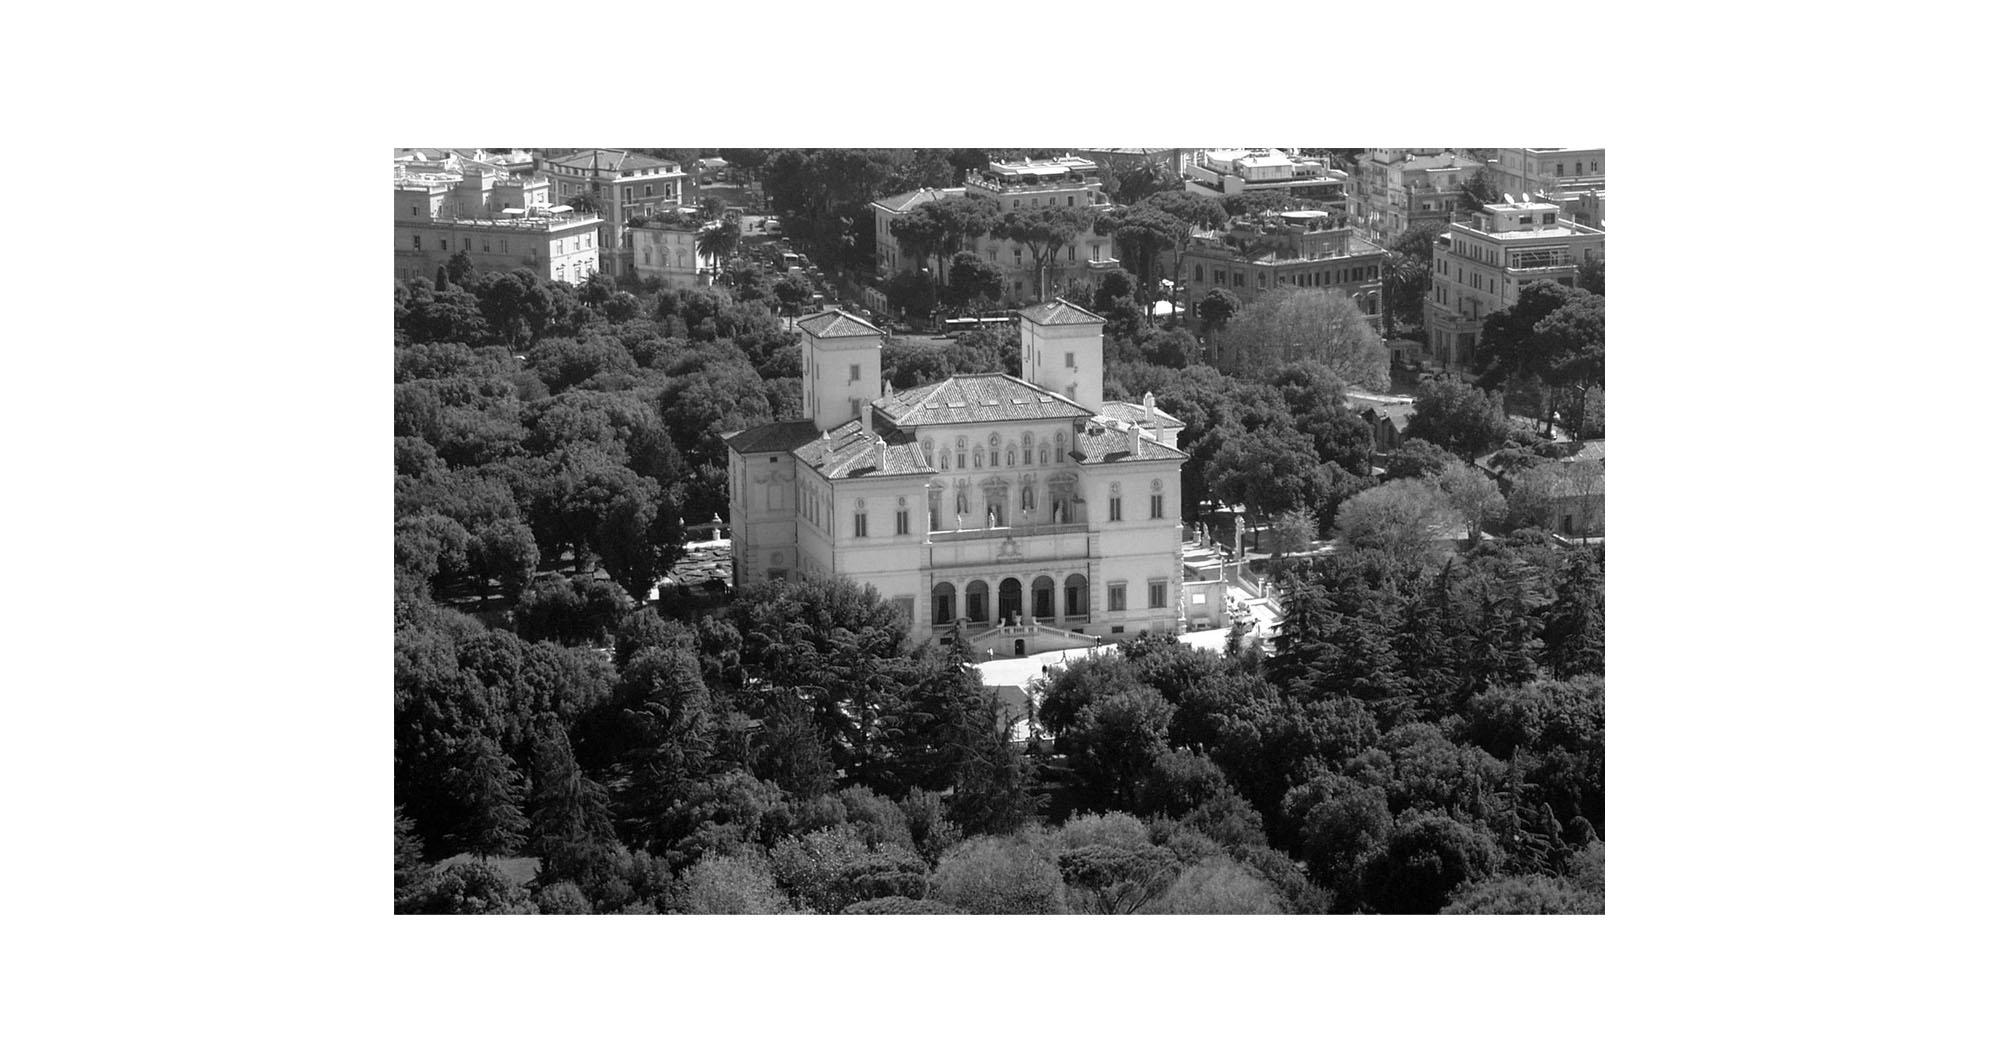 Villa Borghese Museum Bookshop